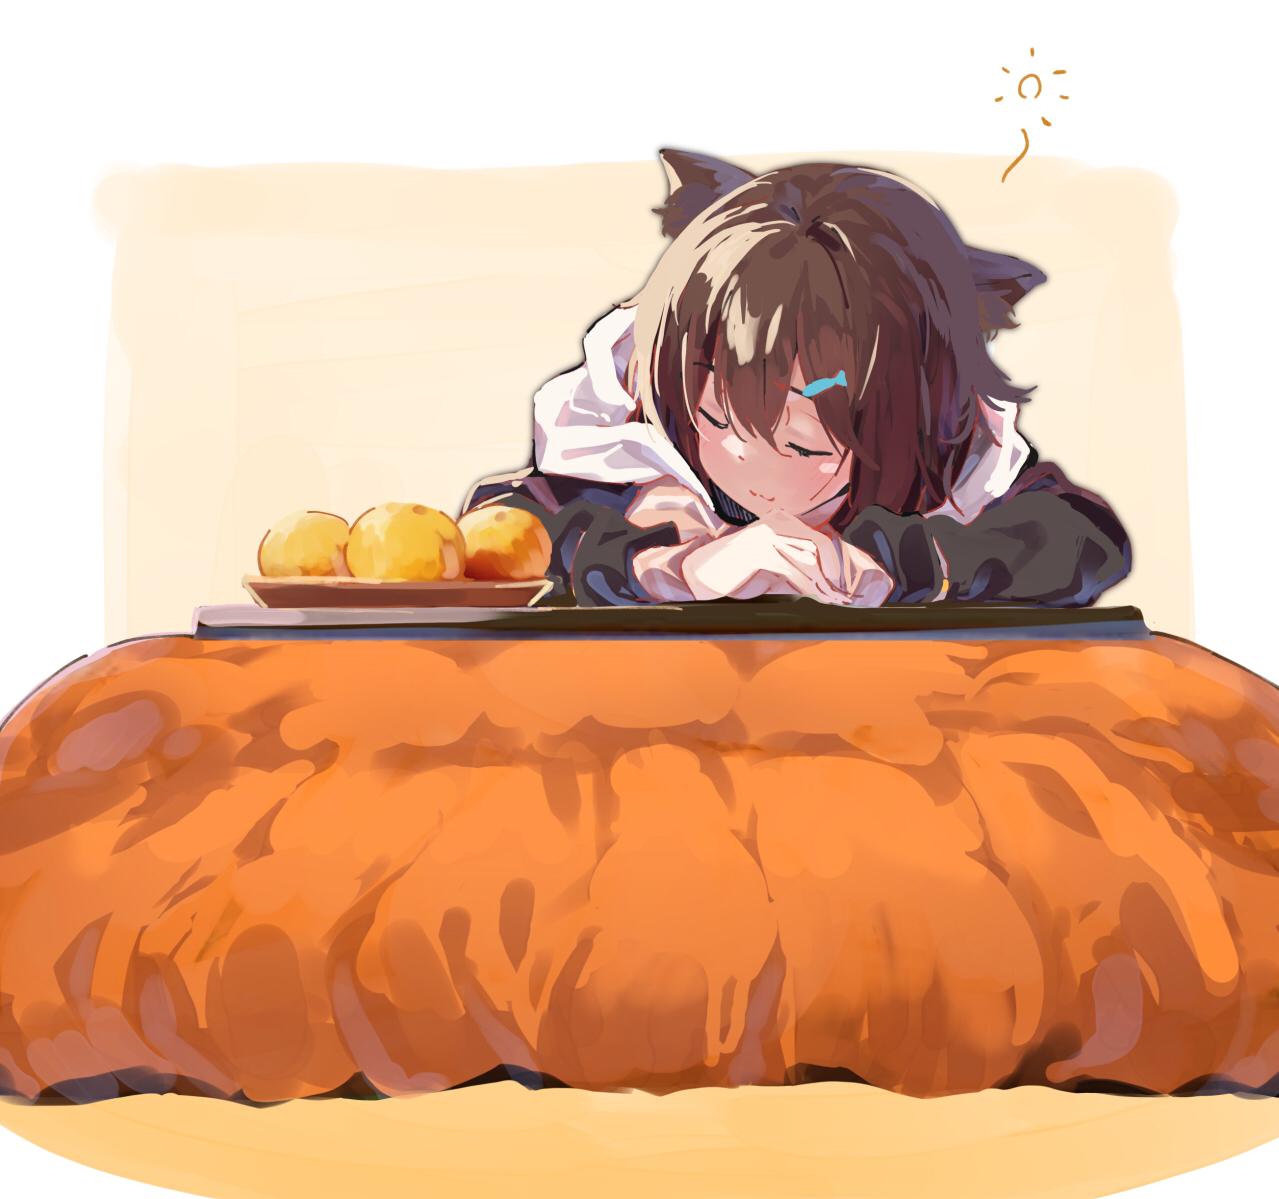 Catnap and kotatsu by らむ [Nijisanji]